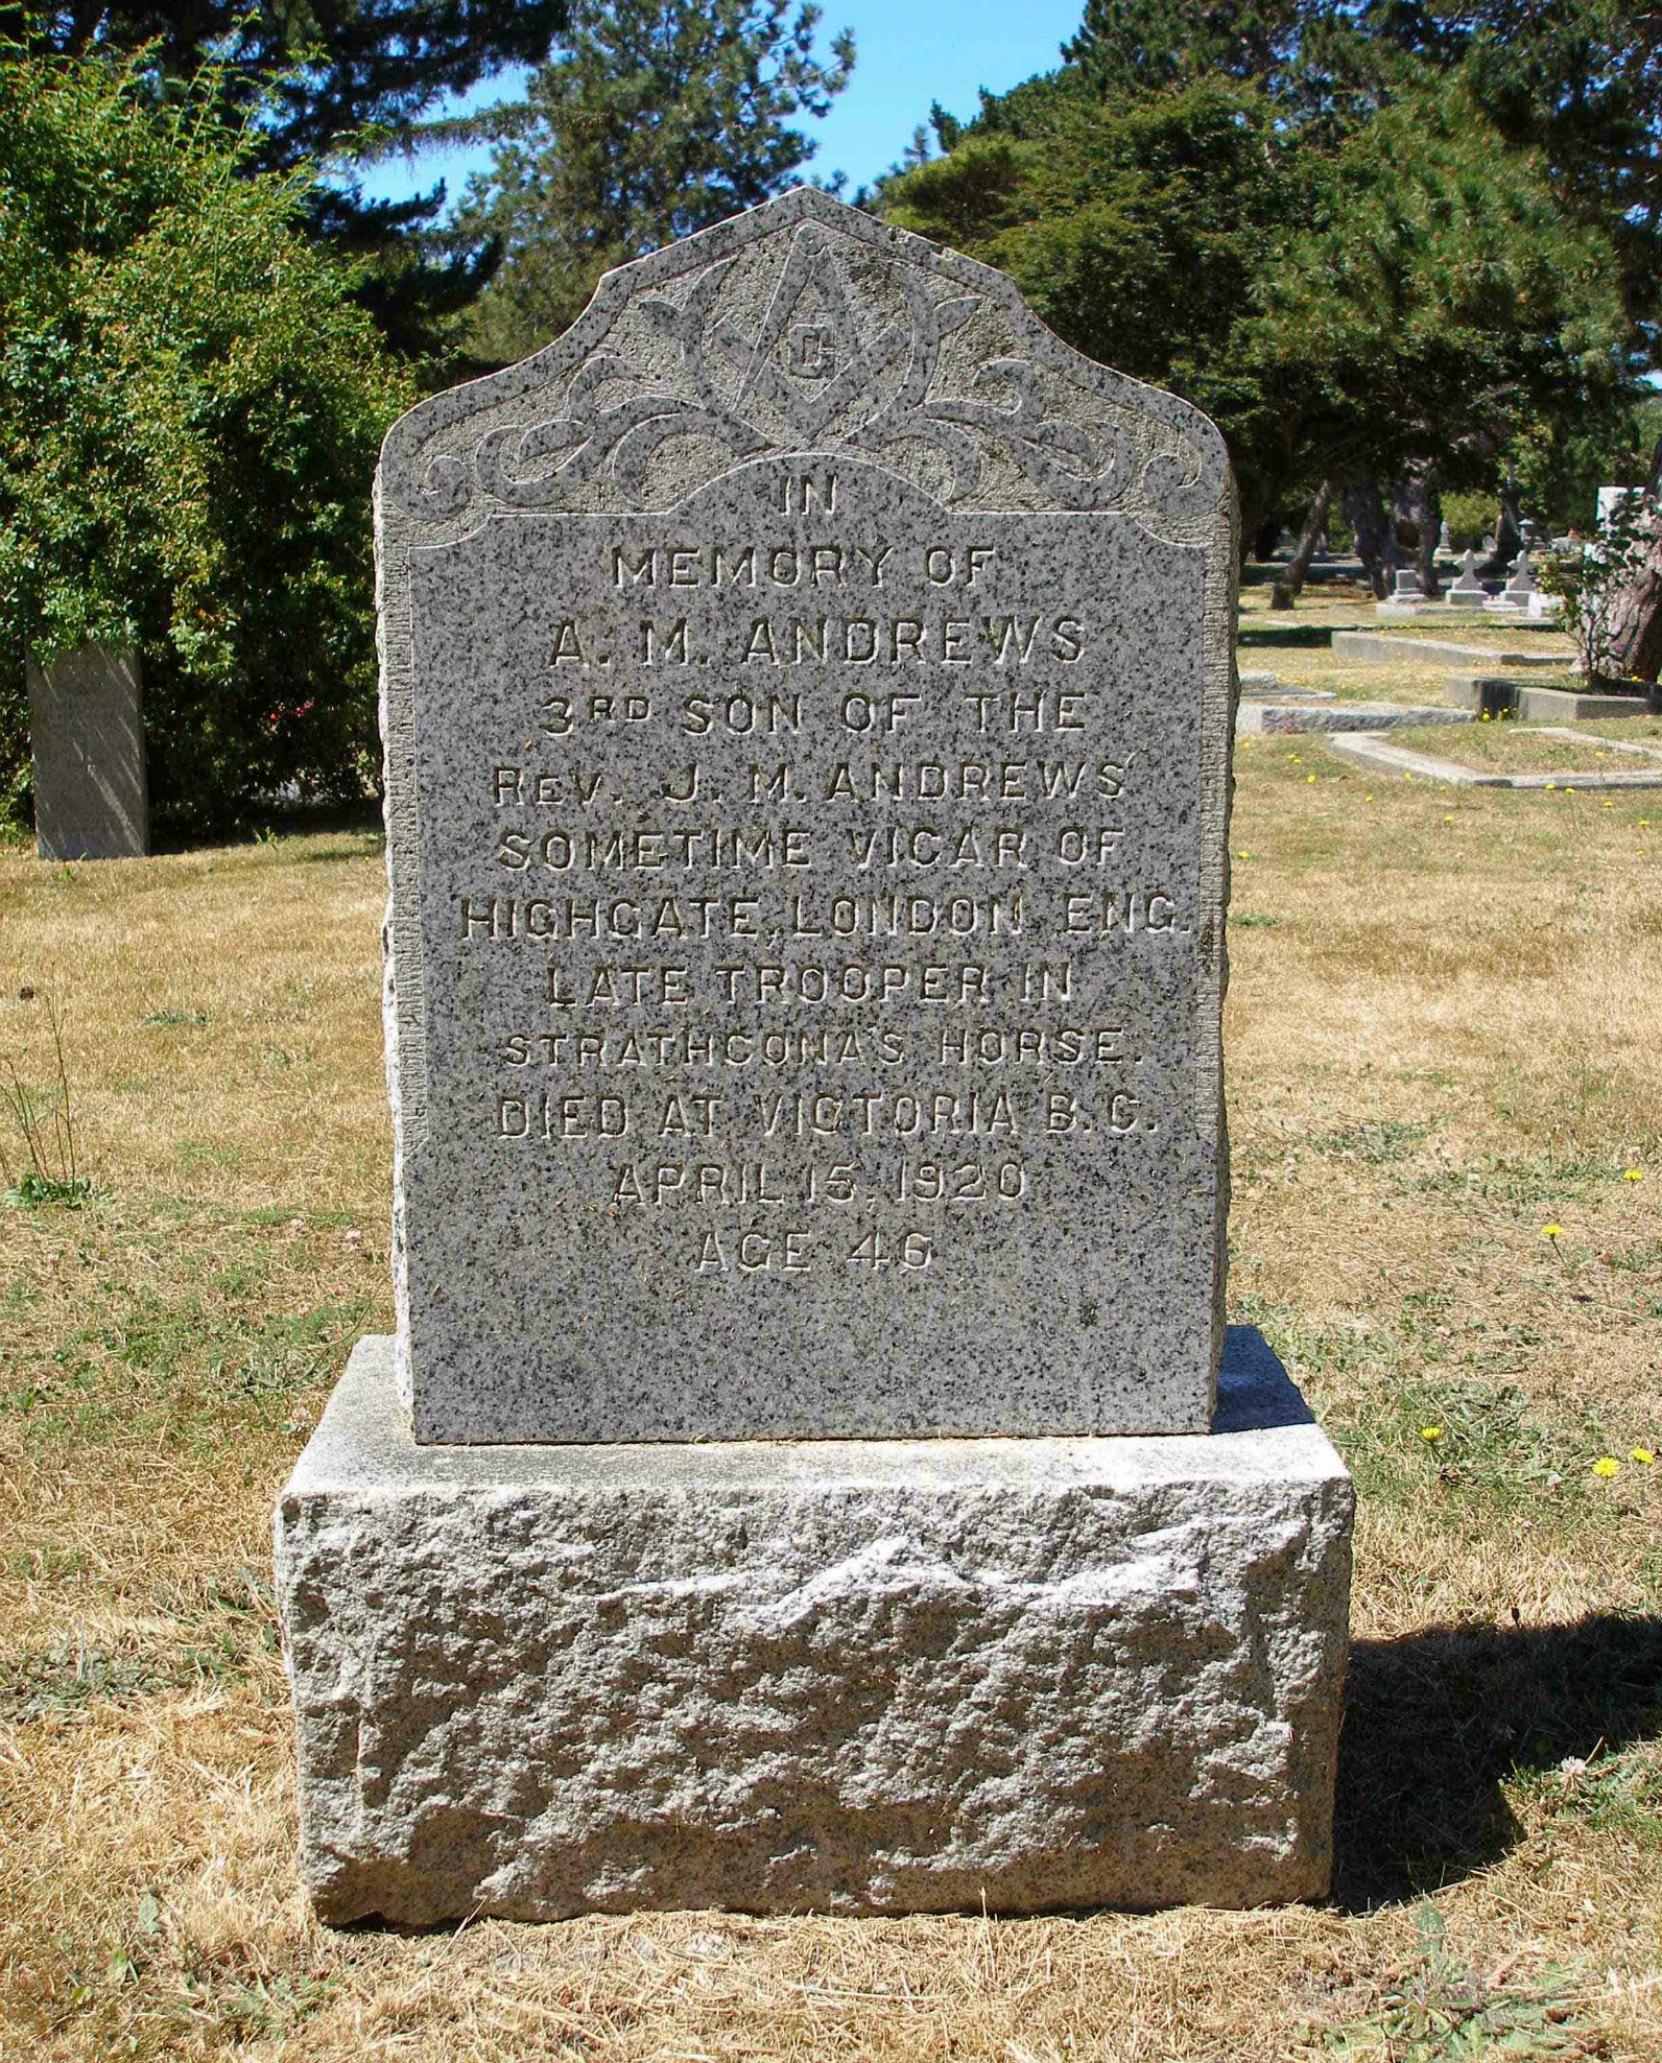 Archibald McLagan Andrews grave, Ross Bay Cemetery, Victoria, B.C.